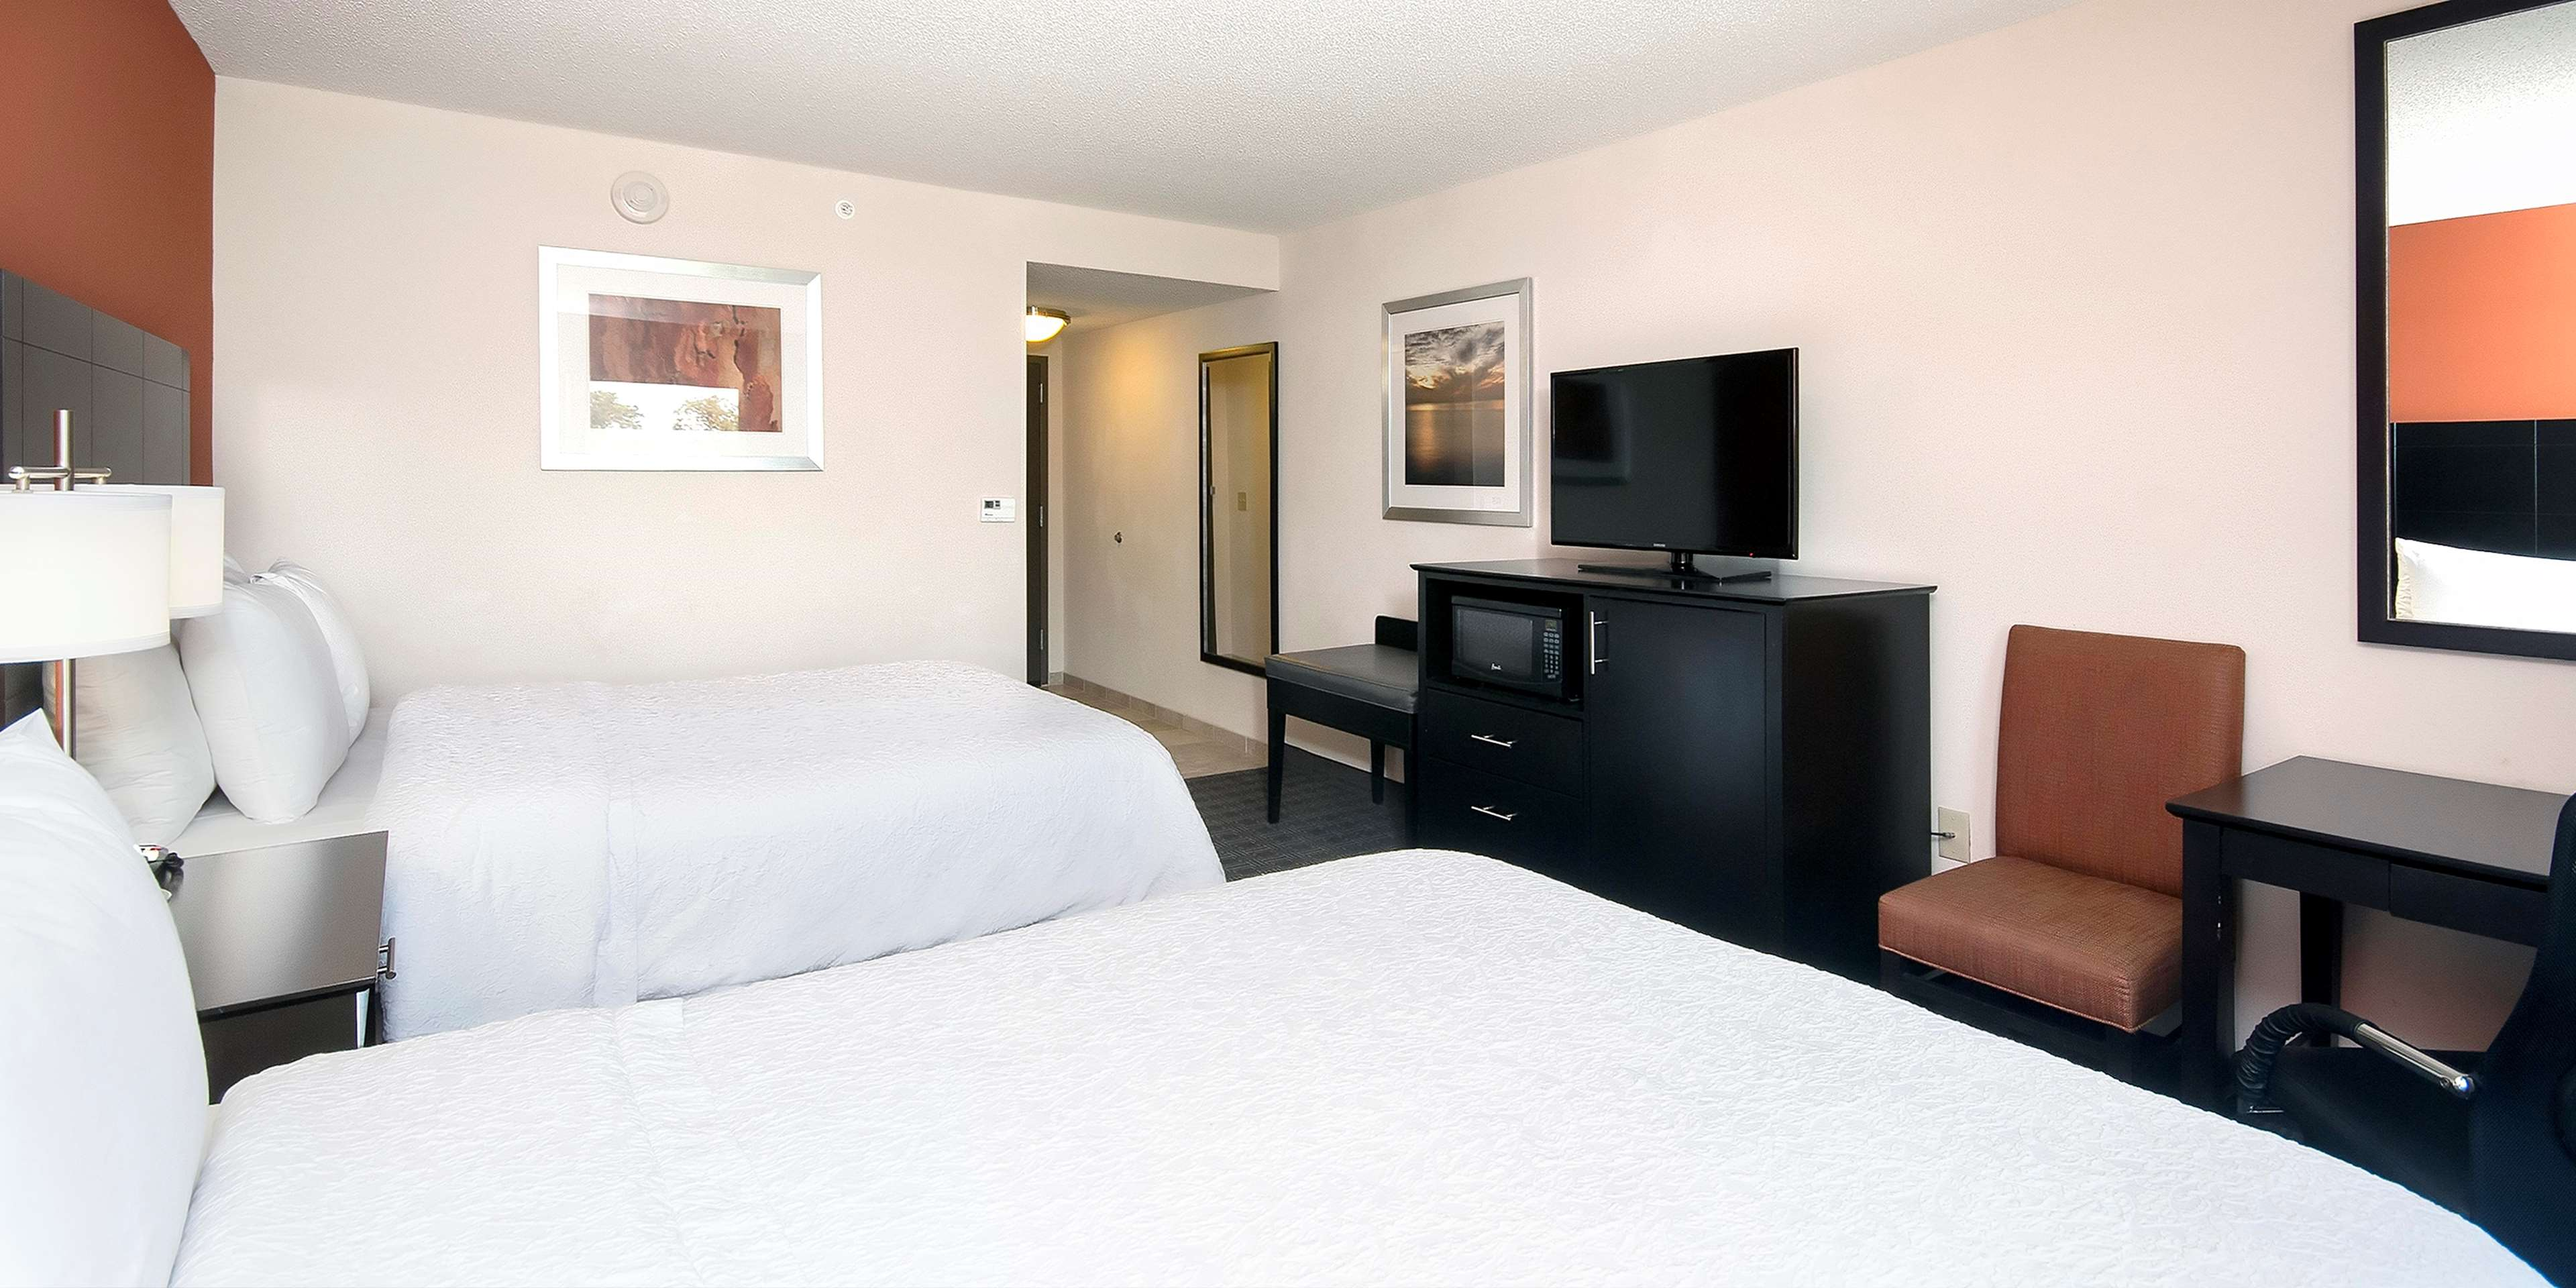 Hampton Inn & Suites Seneca-Clemson Area image 31